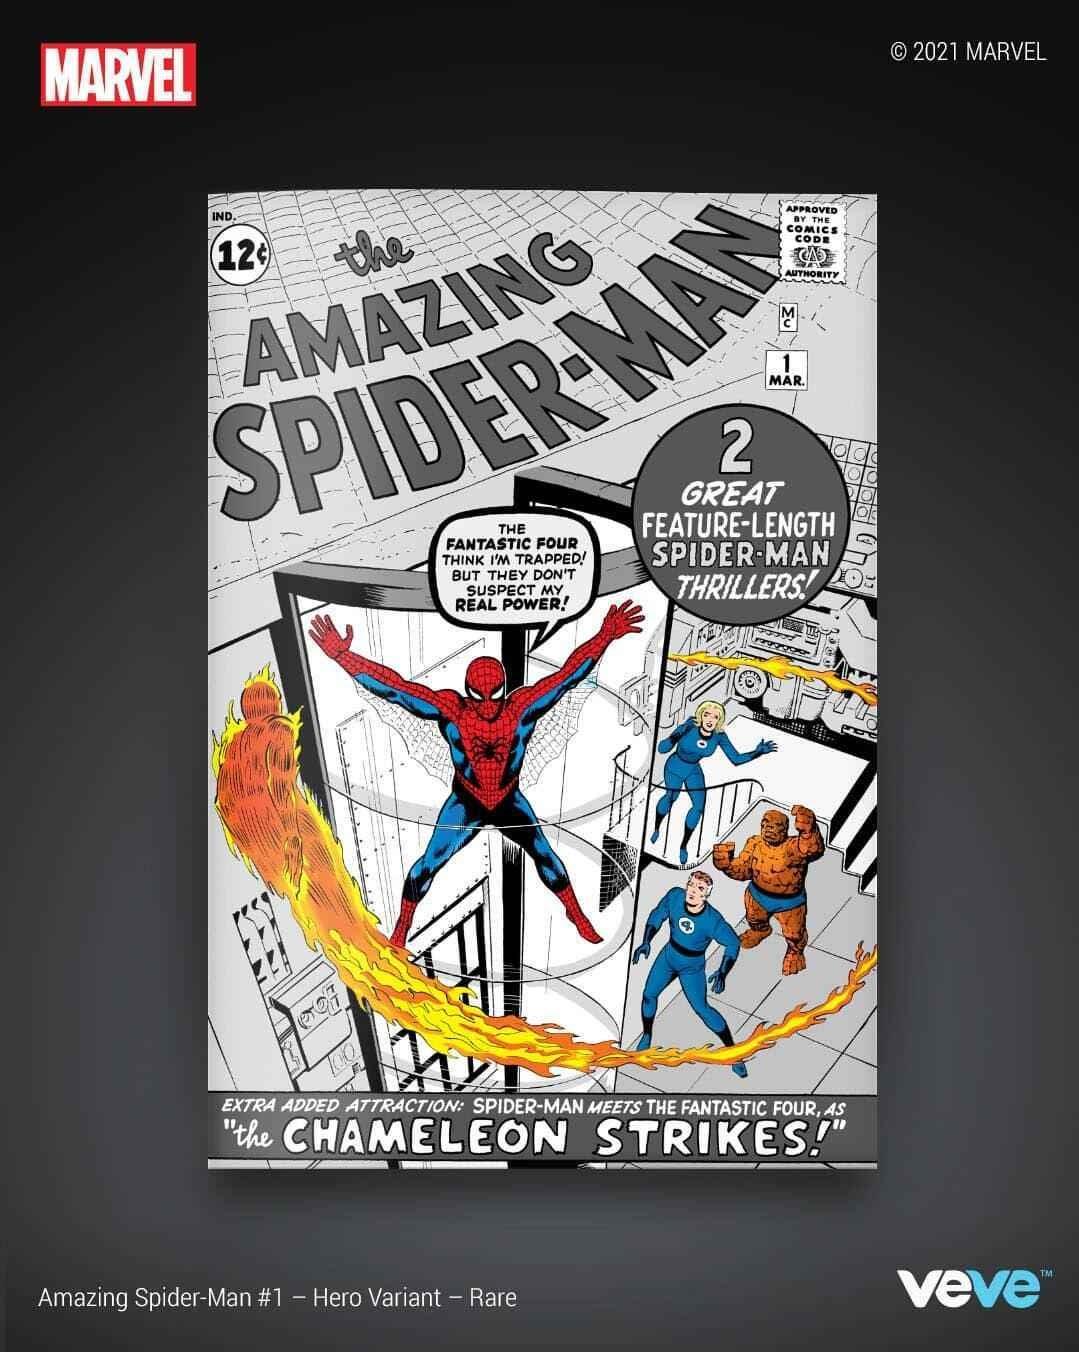 cmc-marvel-amazing-spider-man-01-rare-4_5